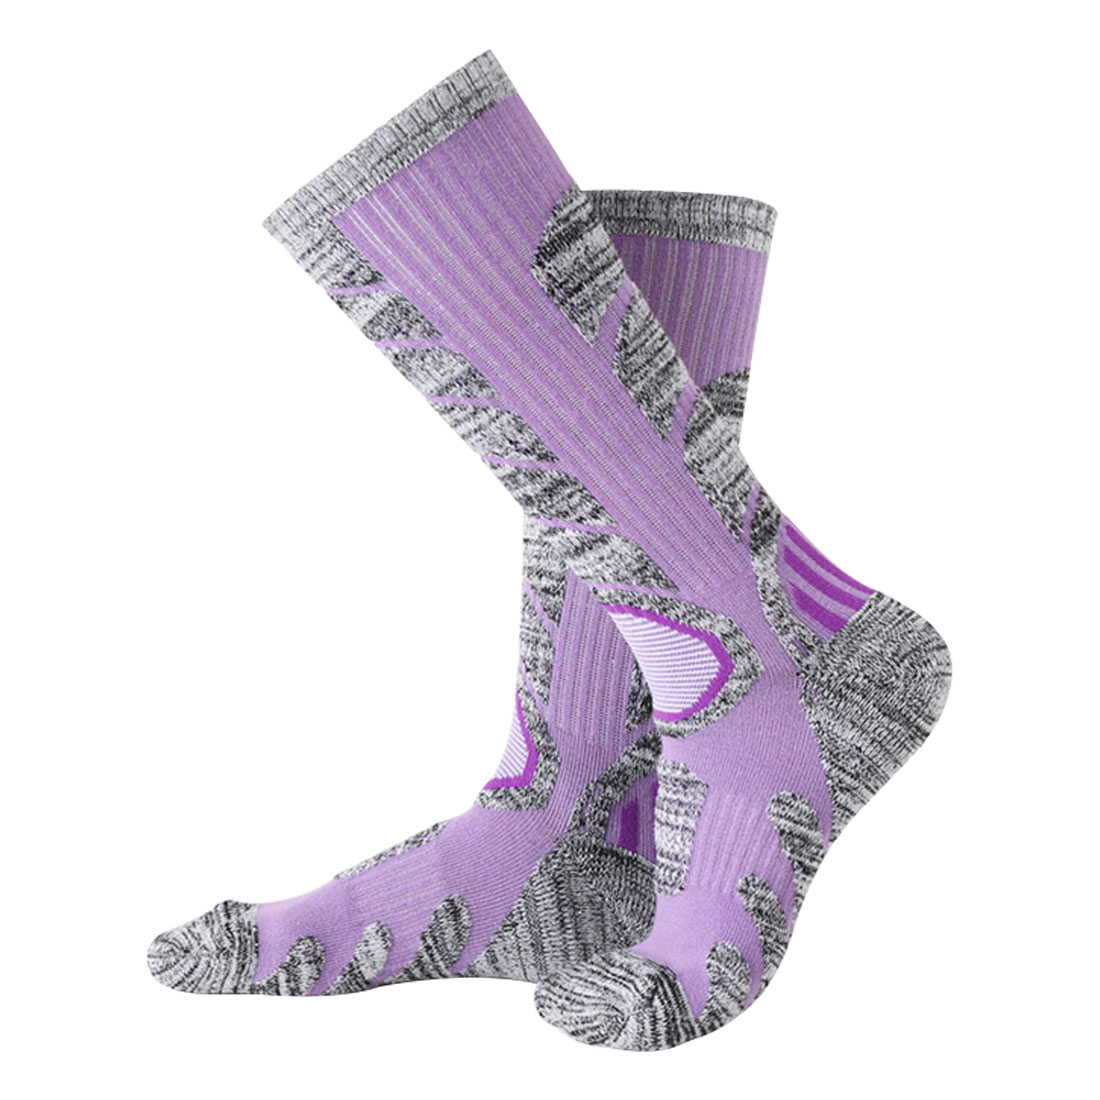 New Winter Warm Men Women Thermal Ski Calcetines Thick Cotton Sports Snowboard Cycling Skiing Soccer Socks Leg Warmers Long Sock